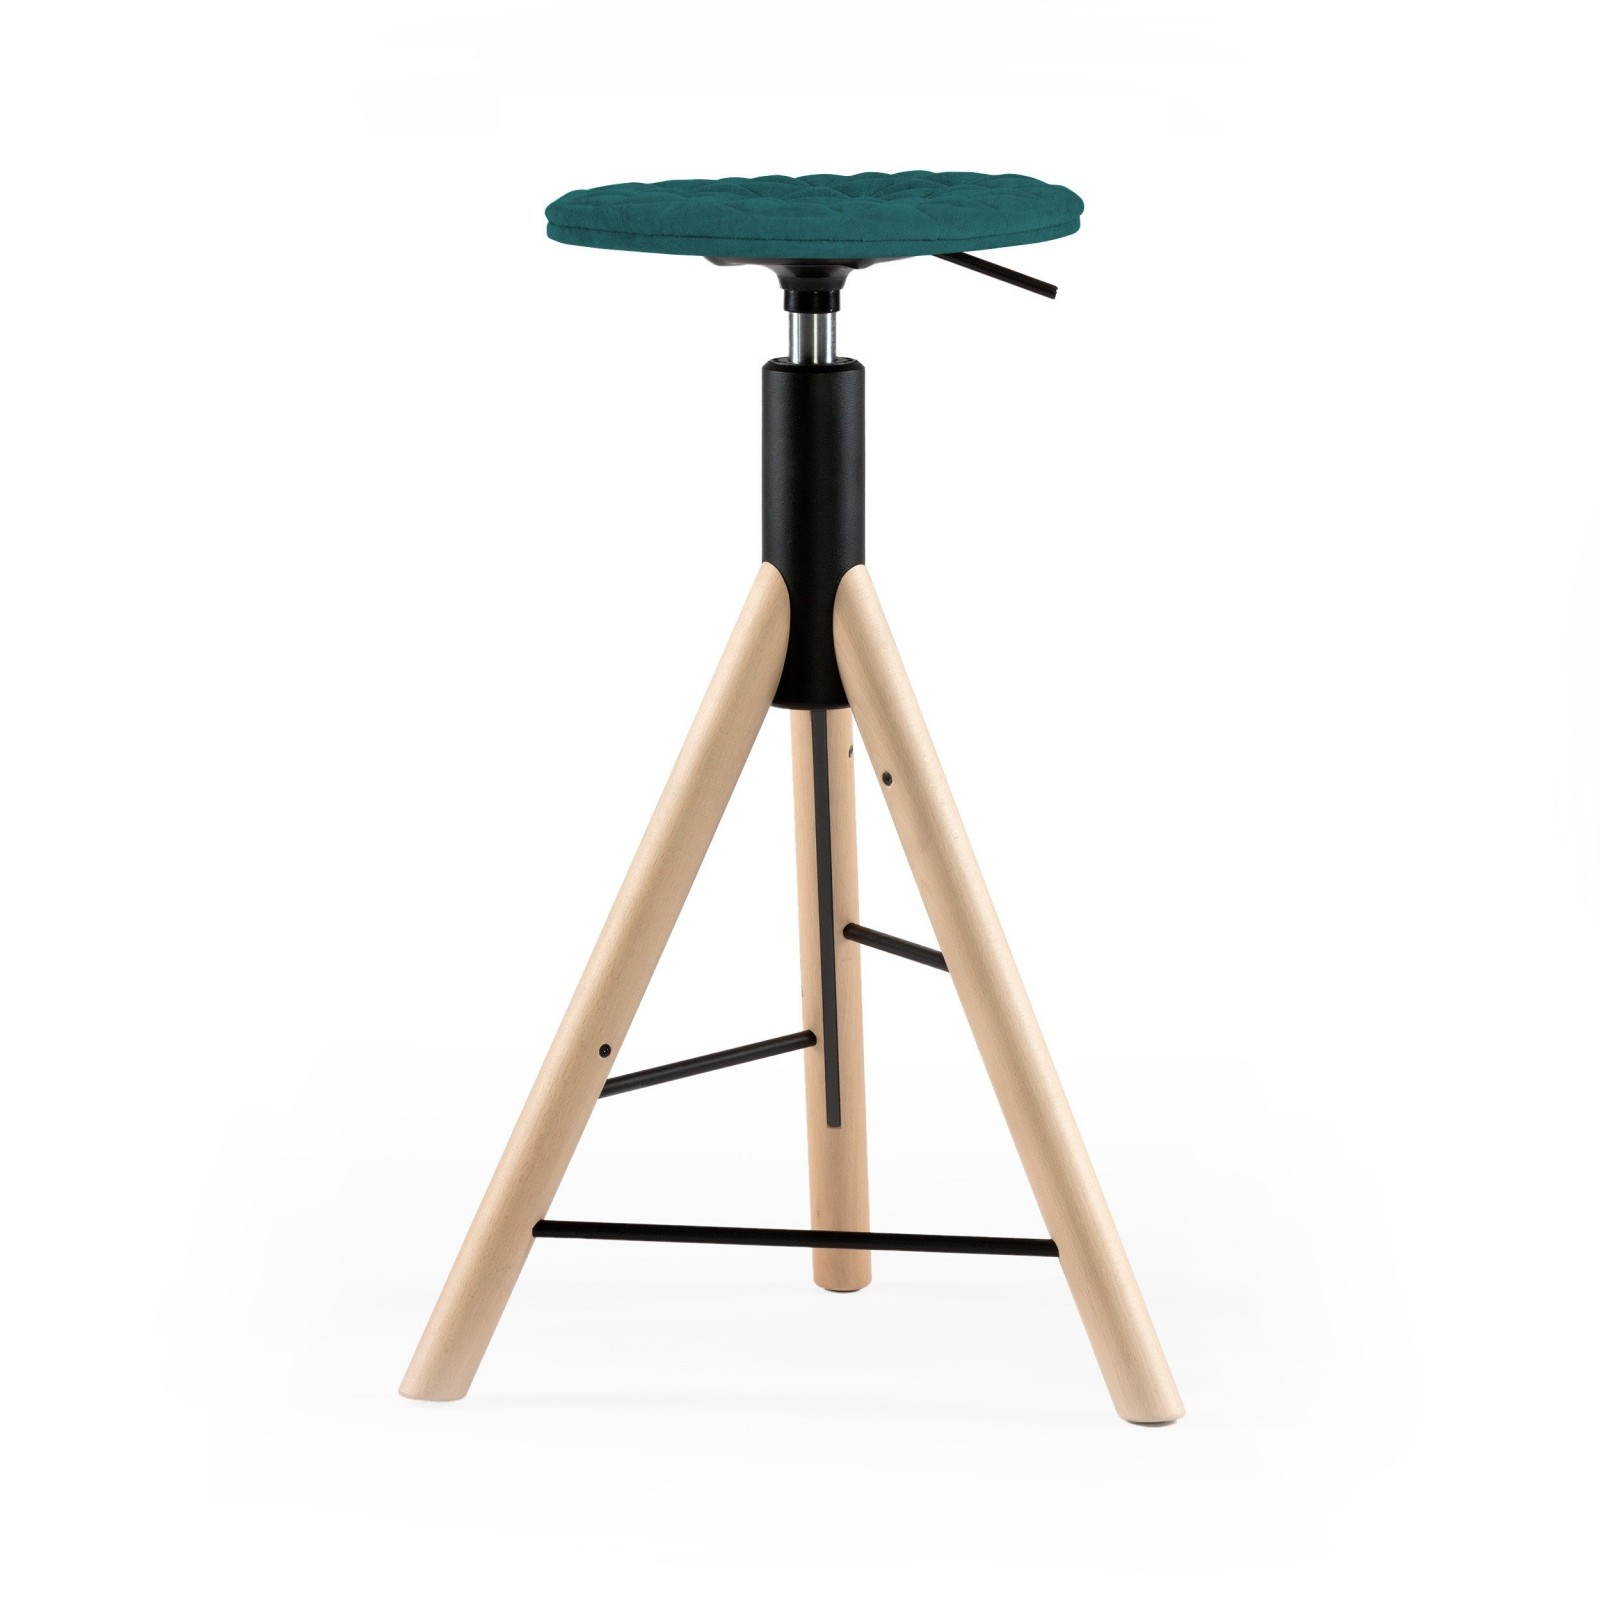 Krzesło barowe MannequinBar natural - 01 - turkus